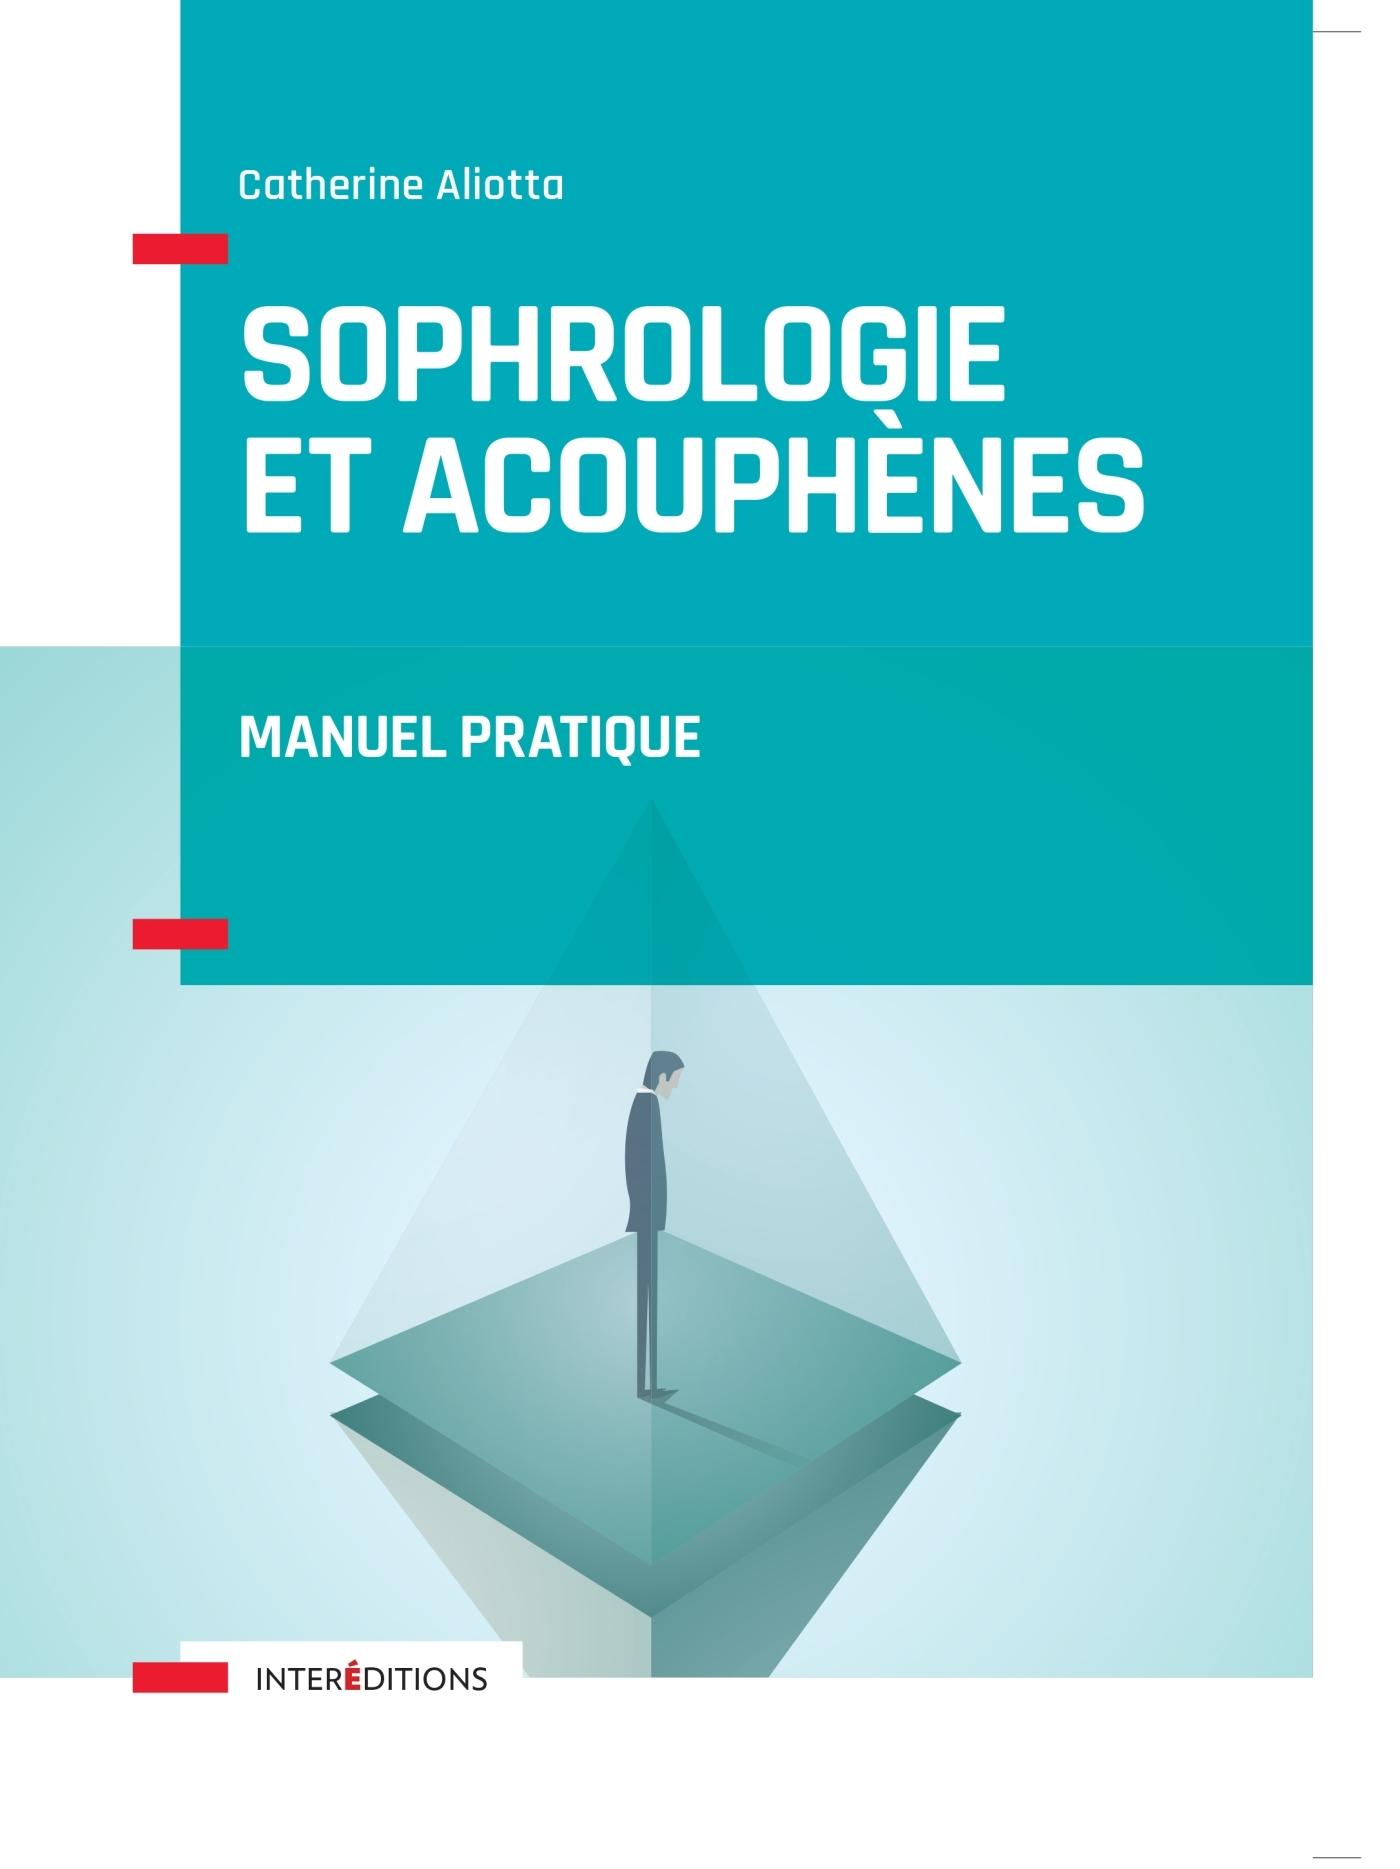 SOPHROLOGIE ET ACOUPHENES - MANUEL PRATIQUE